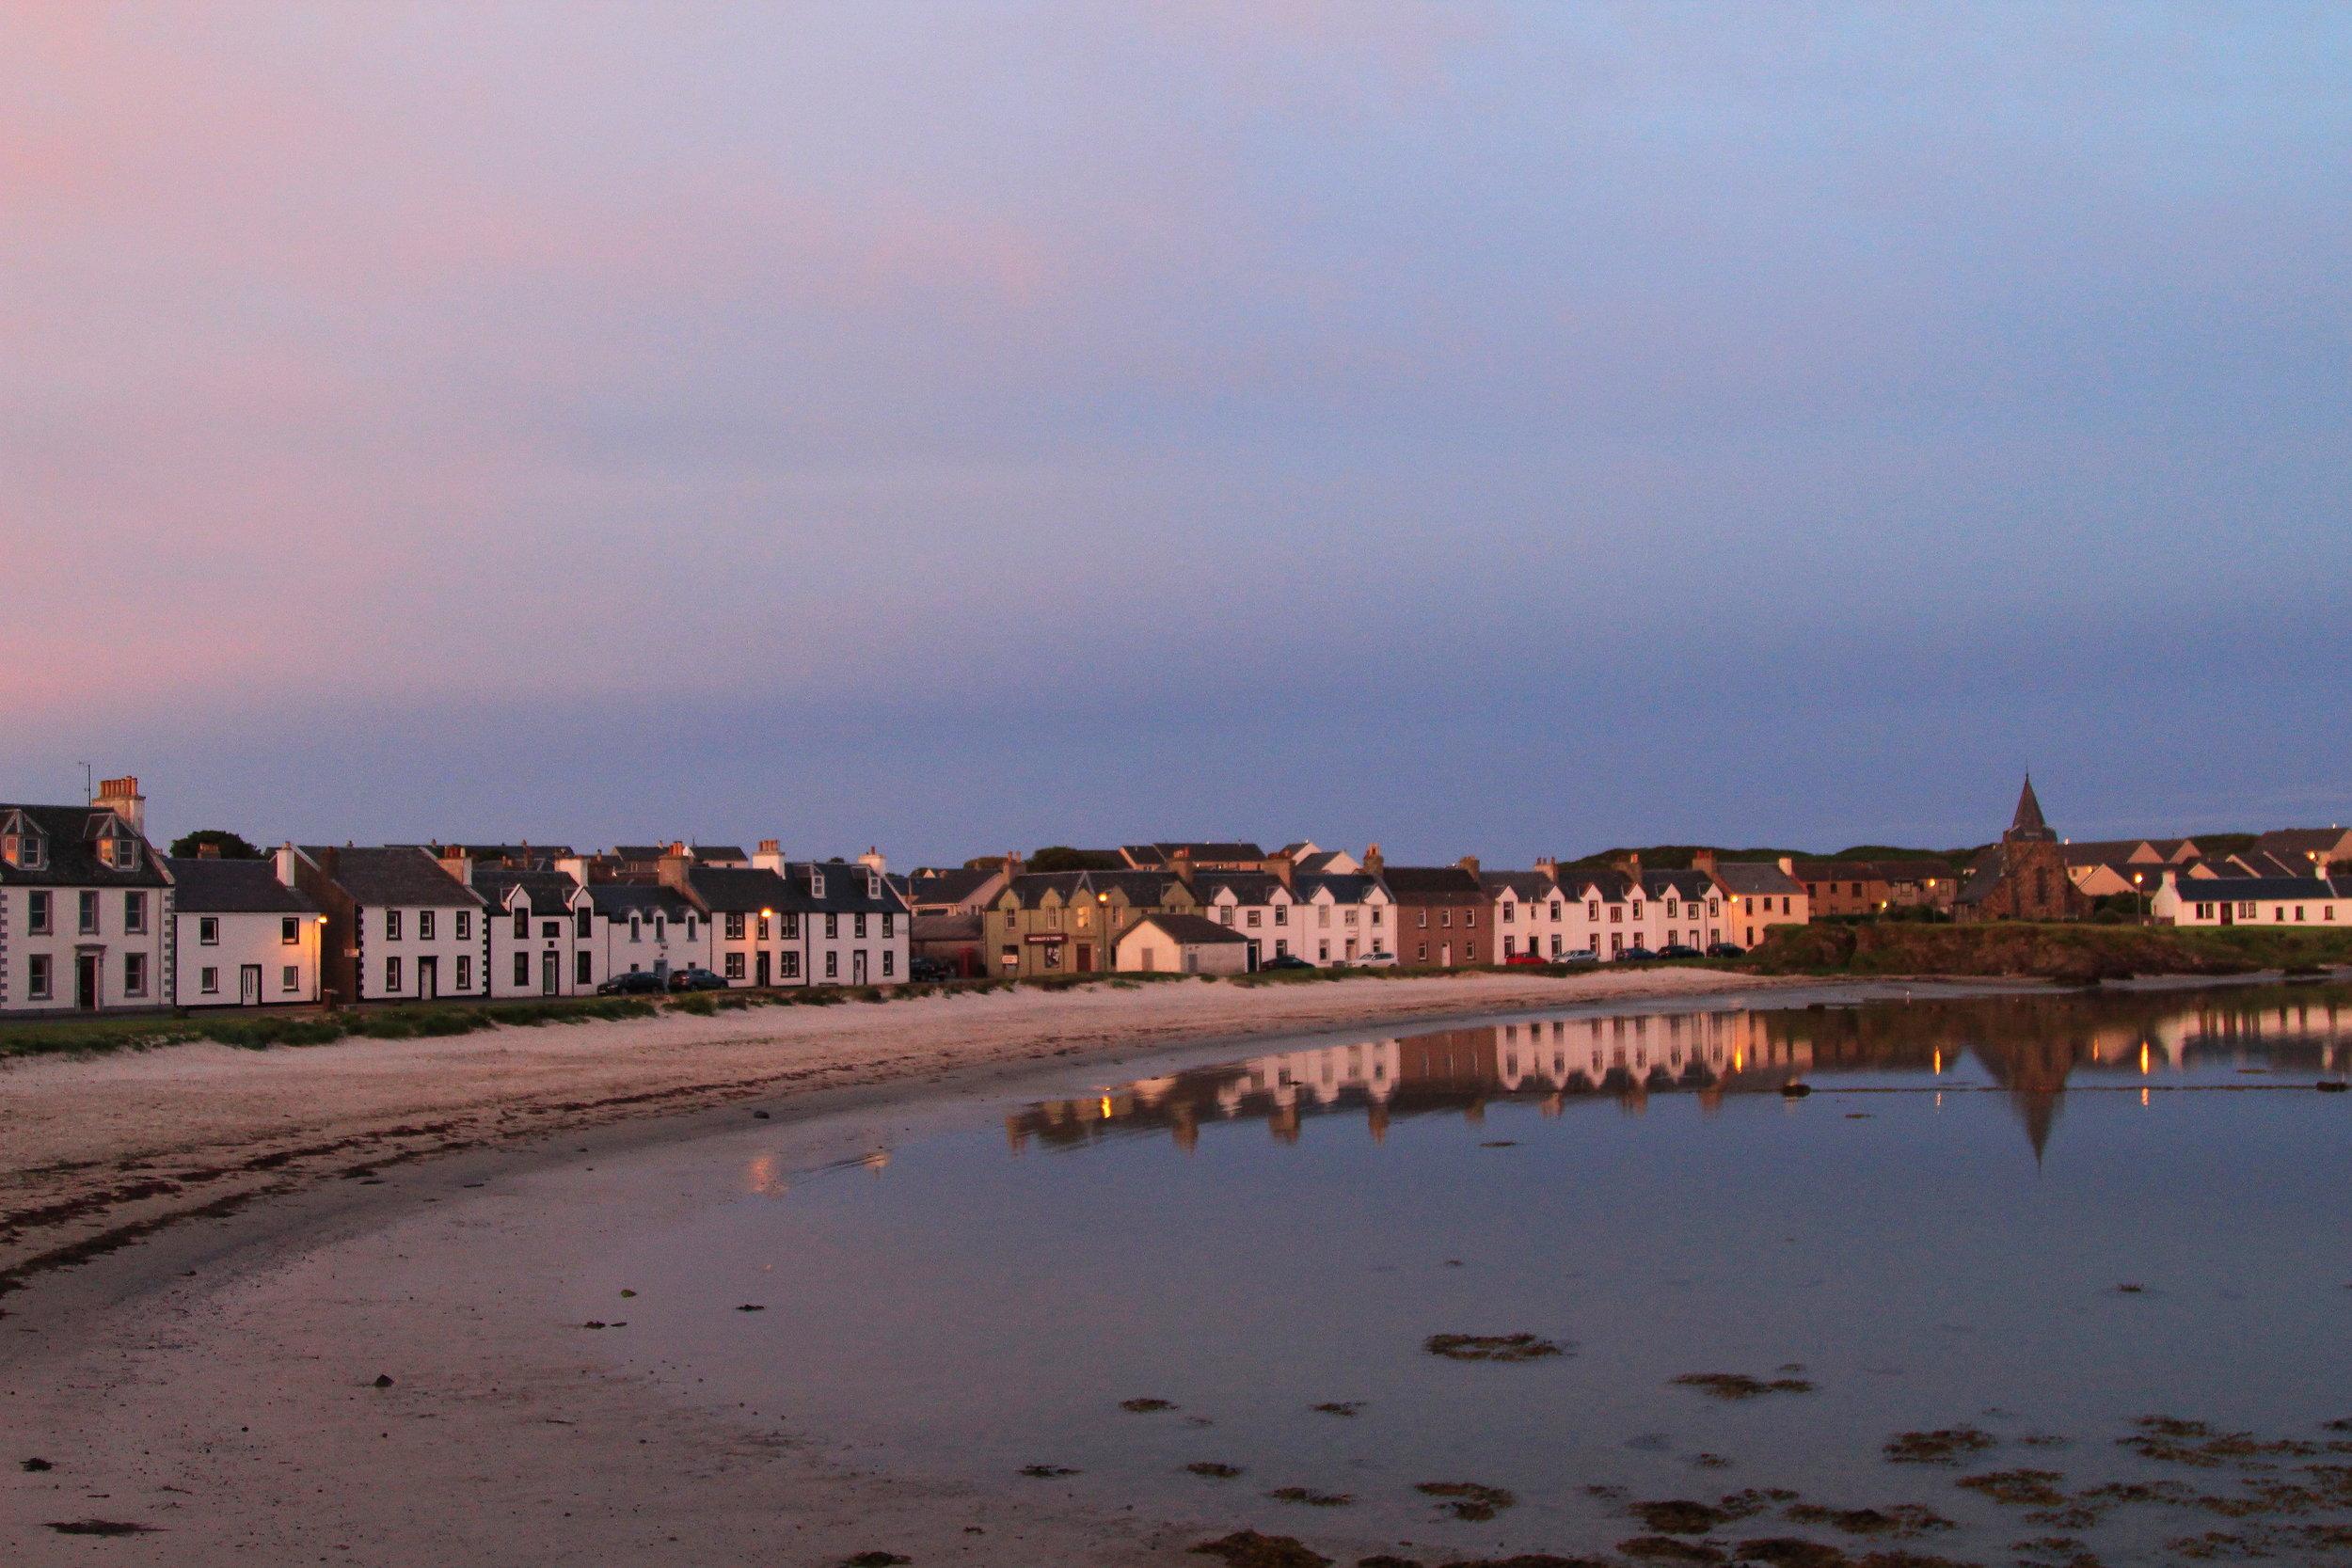 Port Ellen, Scotland